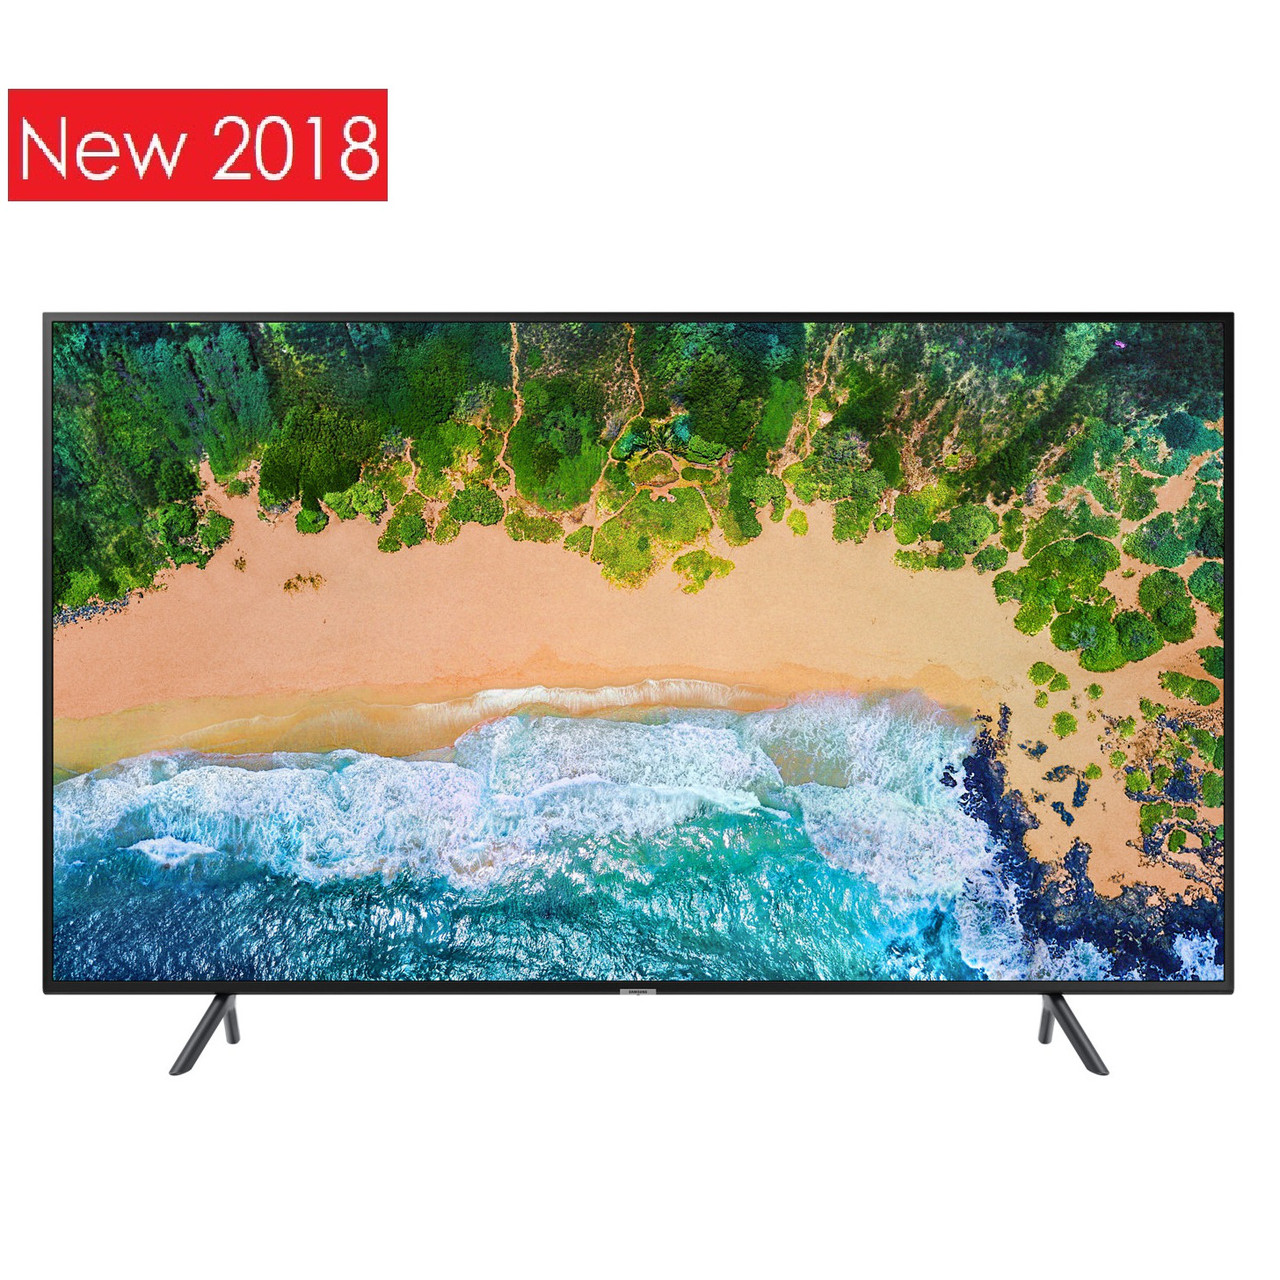 Телевизор Samsung UE75NU7170 (PQI 1300Гц, UltraHD HDR10, Smart, Tizen 4.0, DVB-C/T2/S2)